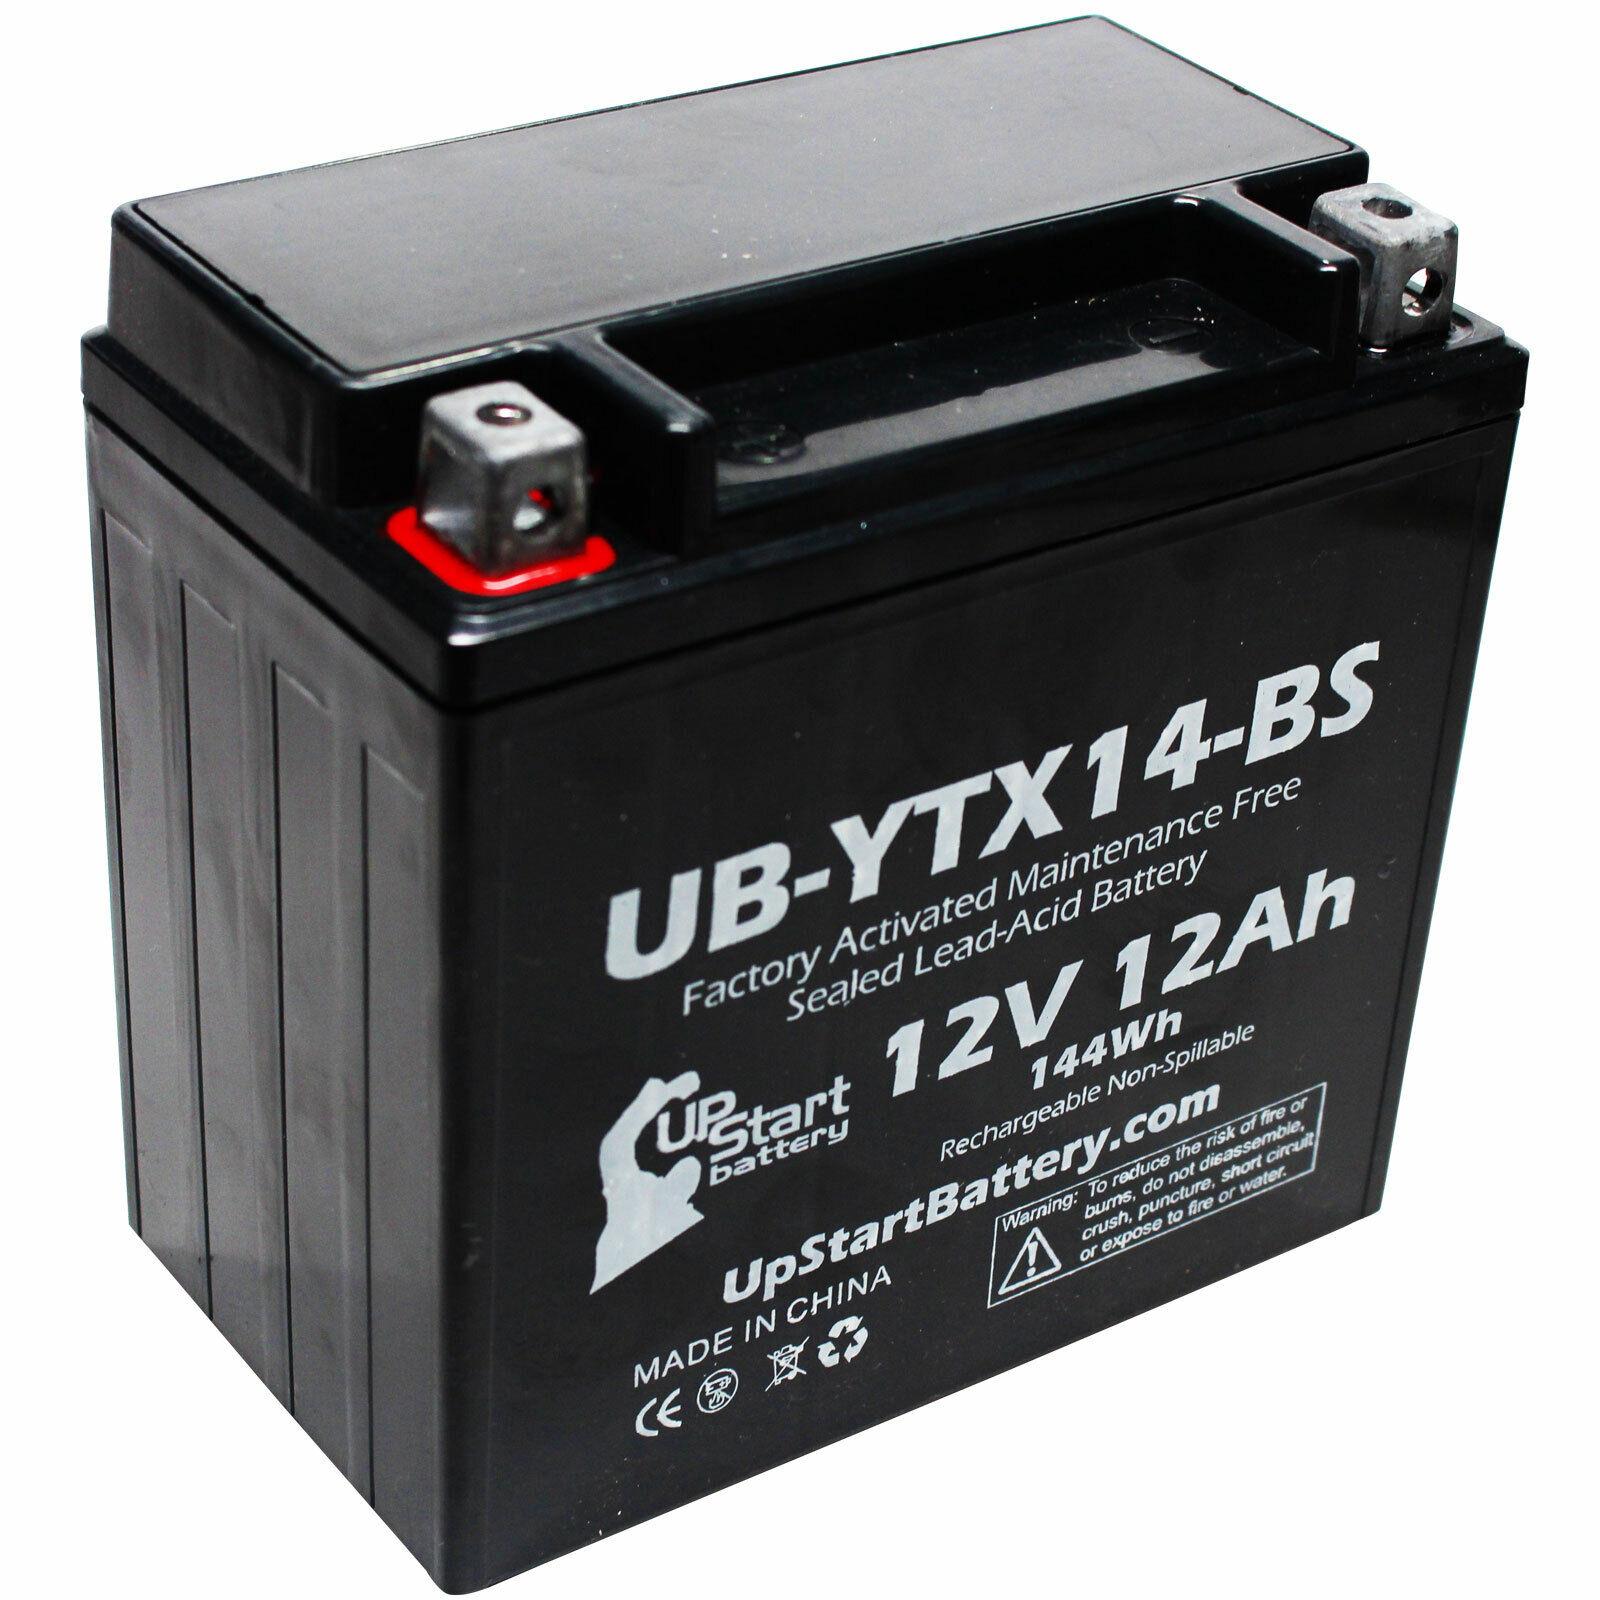 12V 12AH Battery for 2004 Honda TRX350 Rancher 350 CC